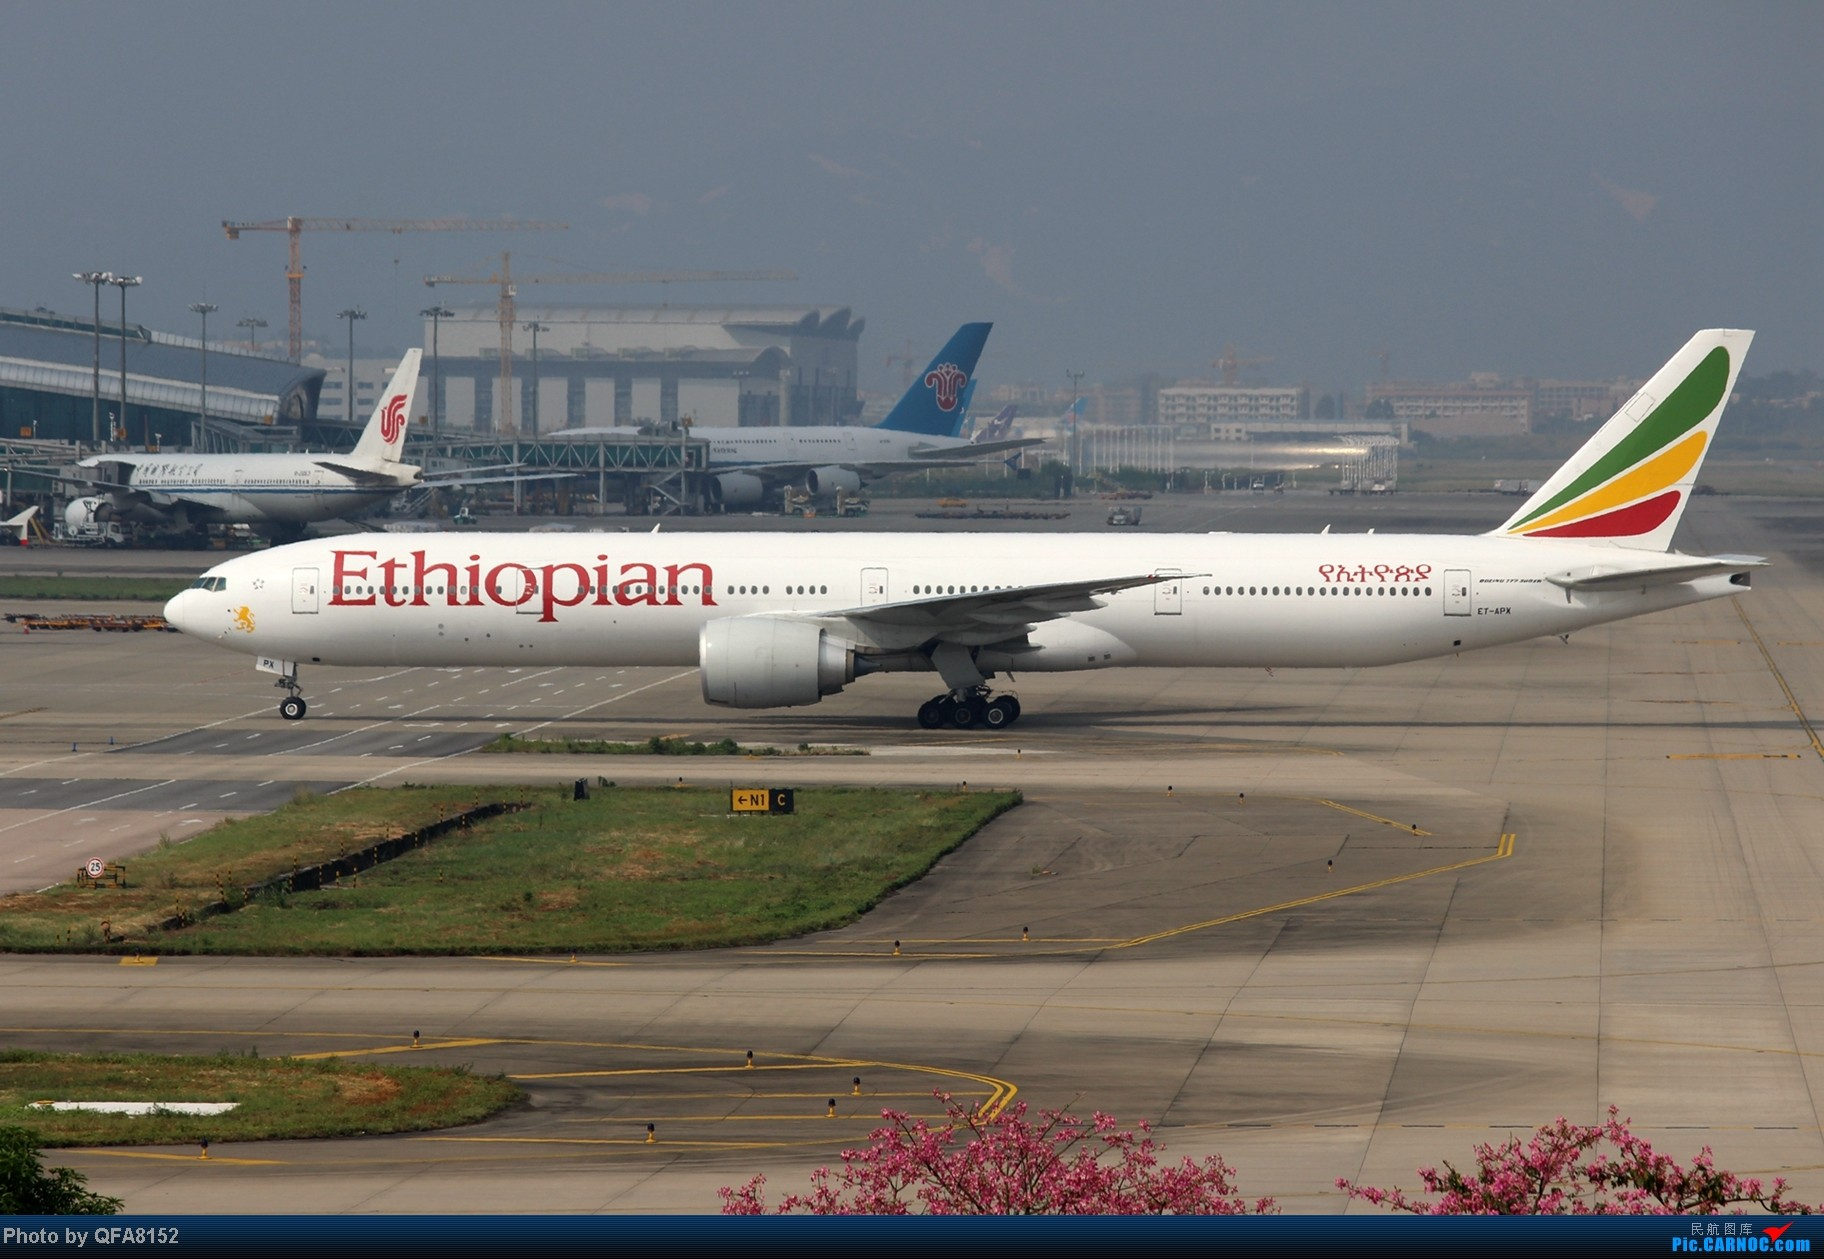 Re:[原创]2014.10.2广州白云消防塔拍机 BOEING 777-300ER ET-APX 中国广州白云机场